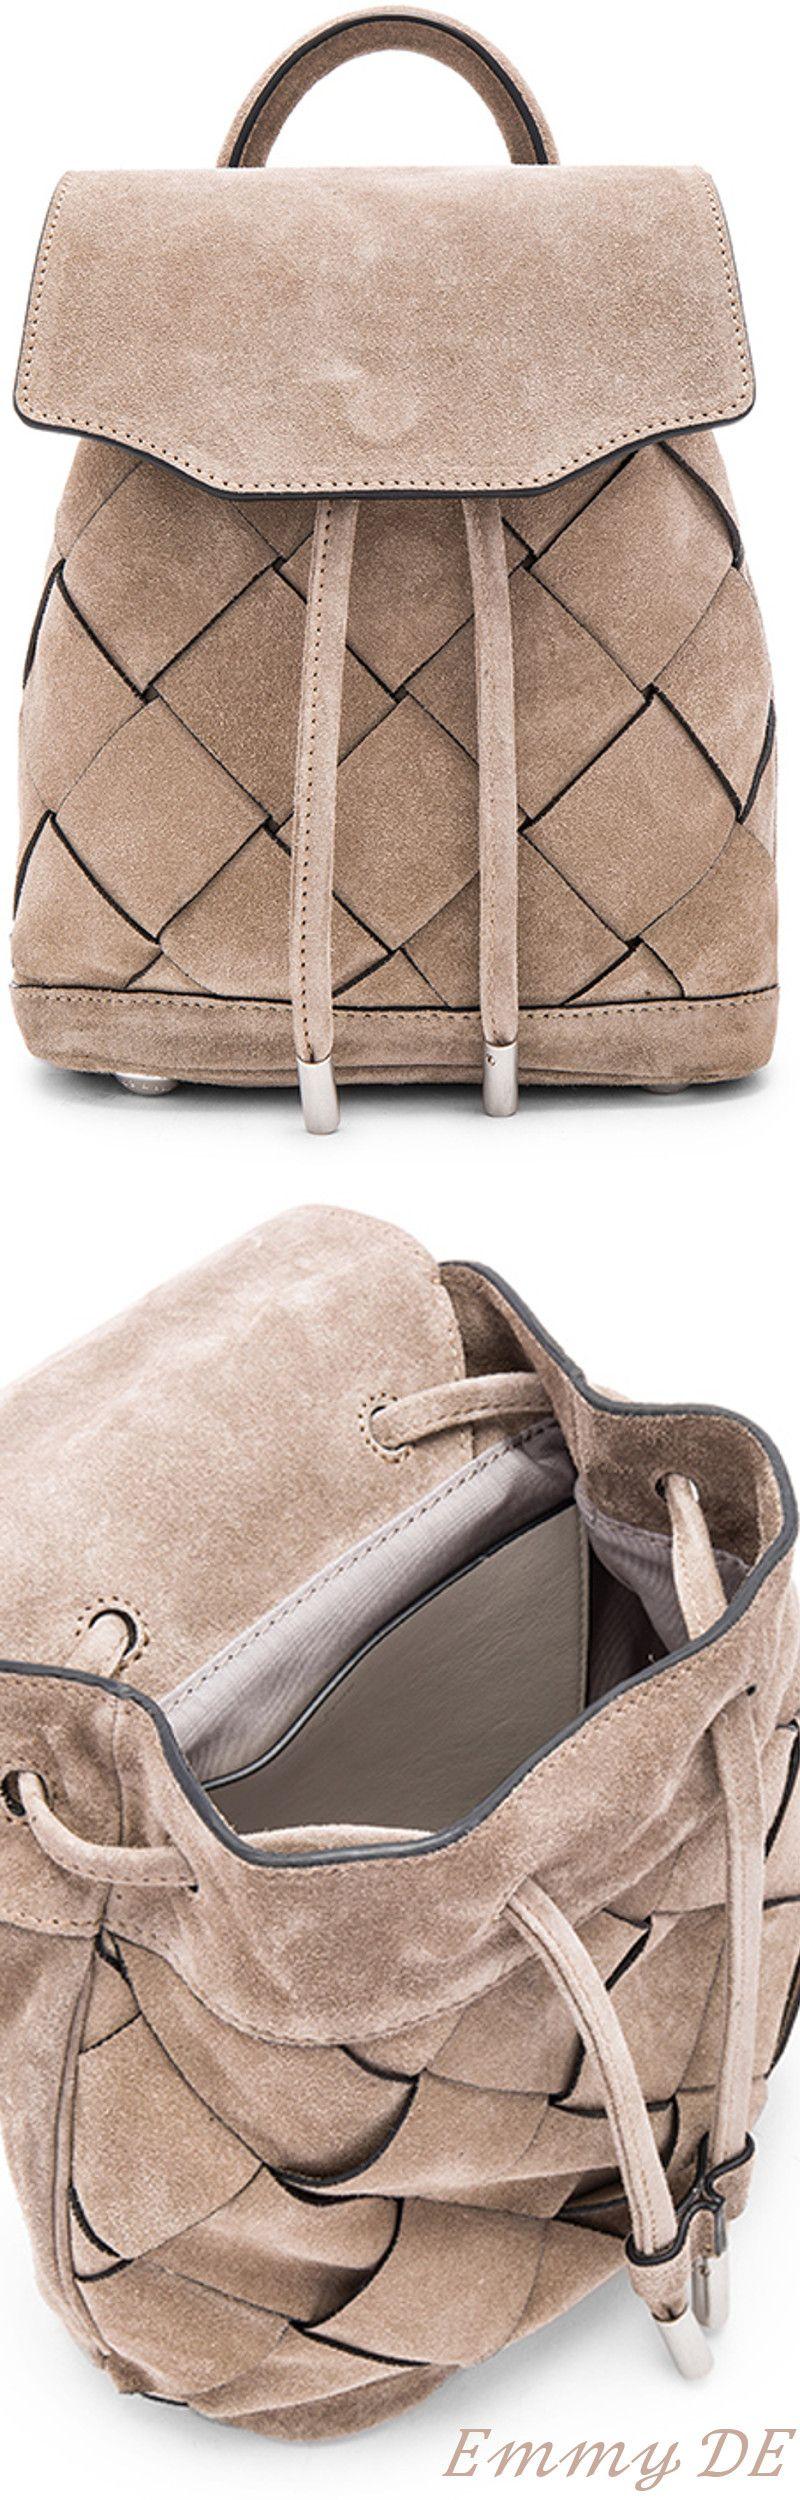 Emmy DE * RAG & BONE Micro Pilot Backpack | Handbags | Pinterest ...